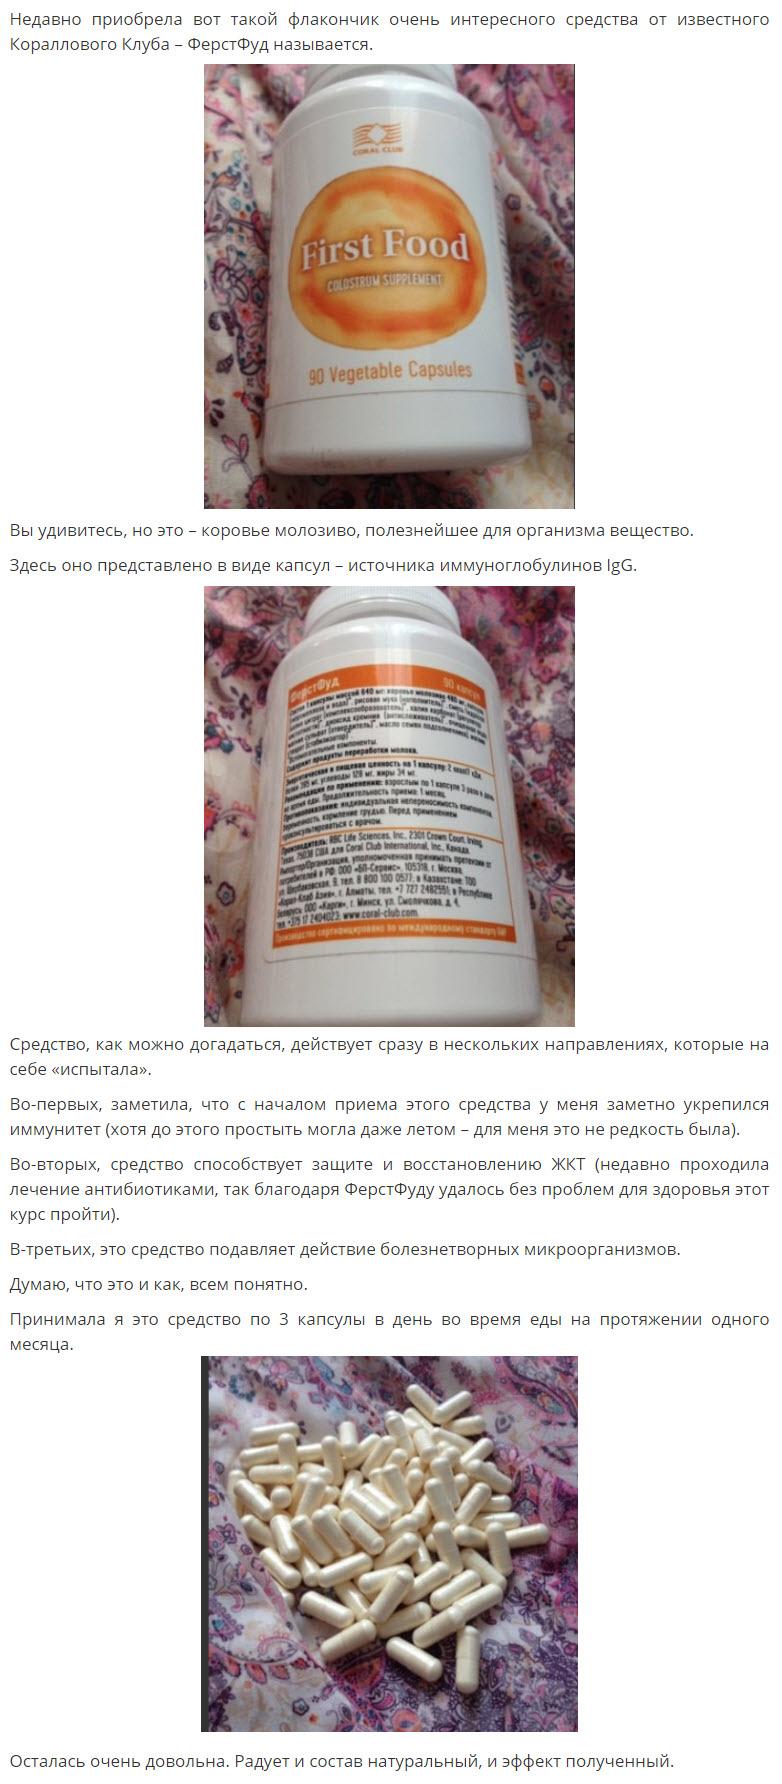 Foto Otziv BAD Immunitet Fers Fud Molozivo Korallovyj Klub